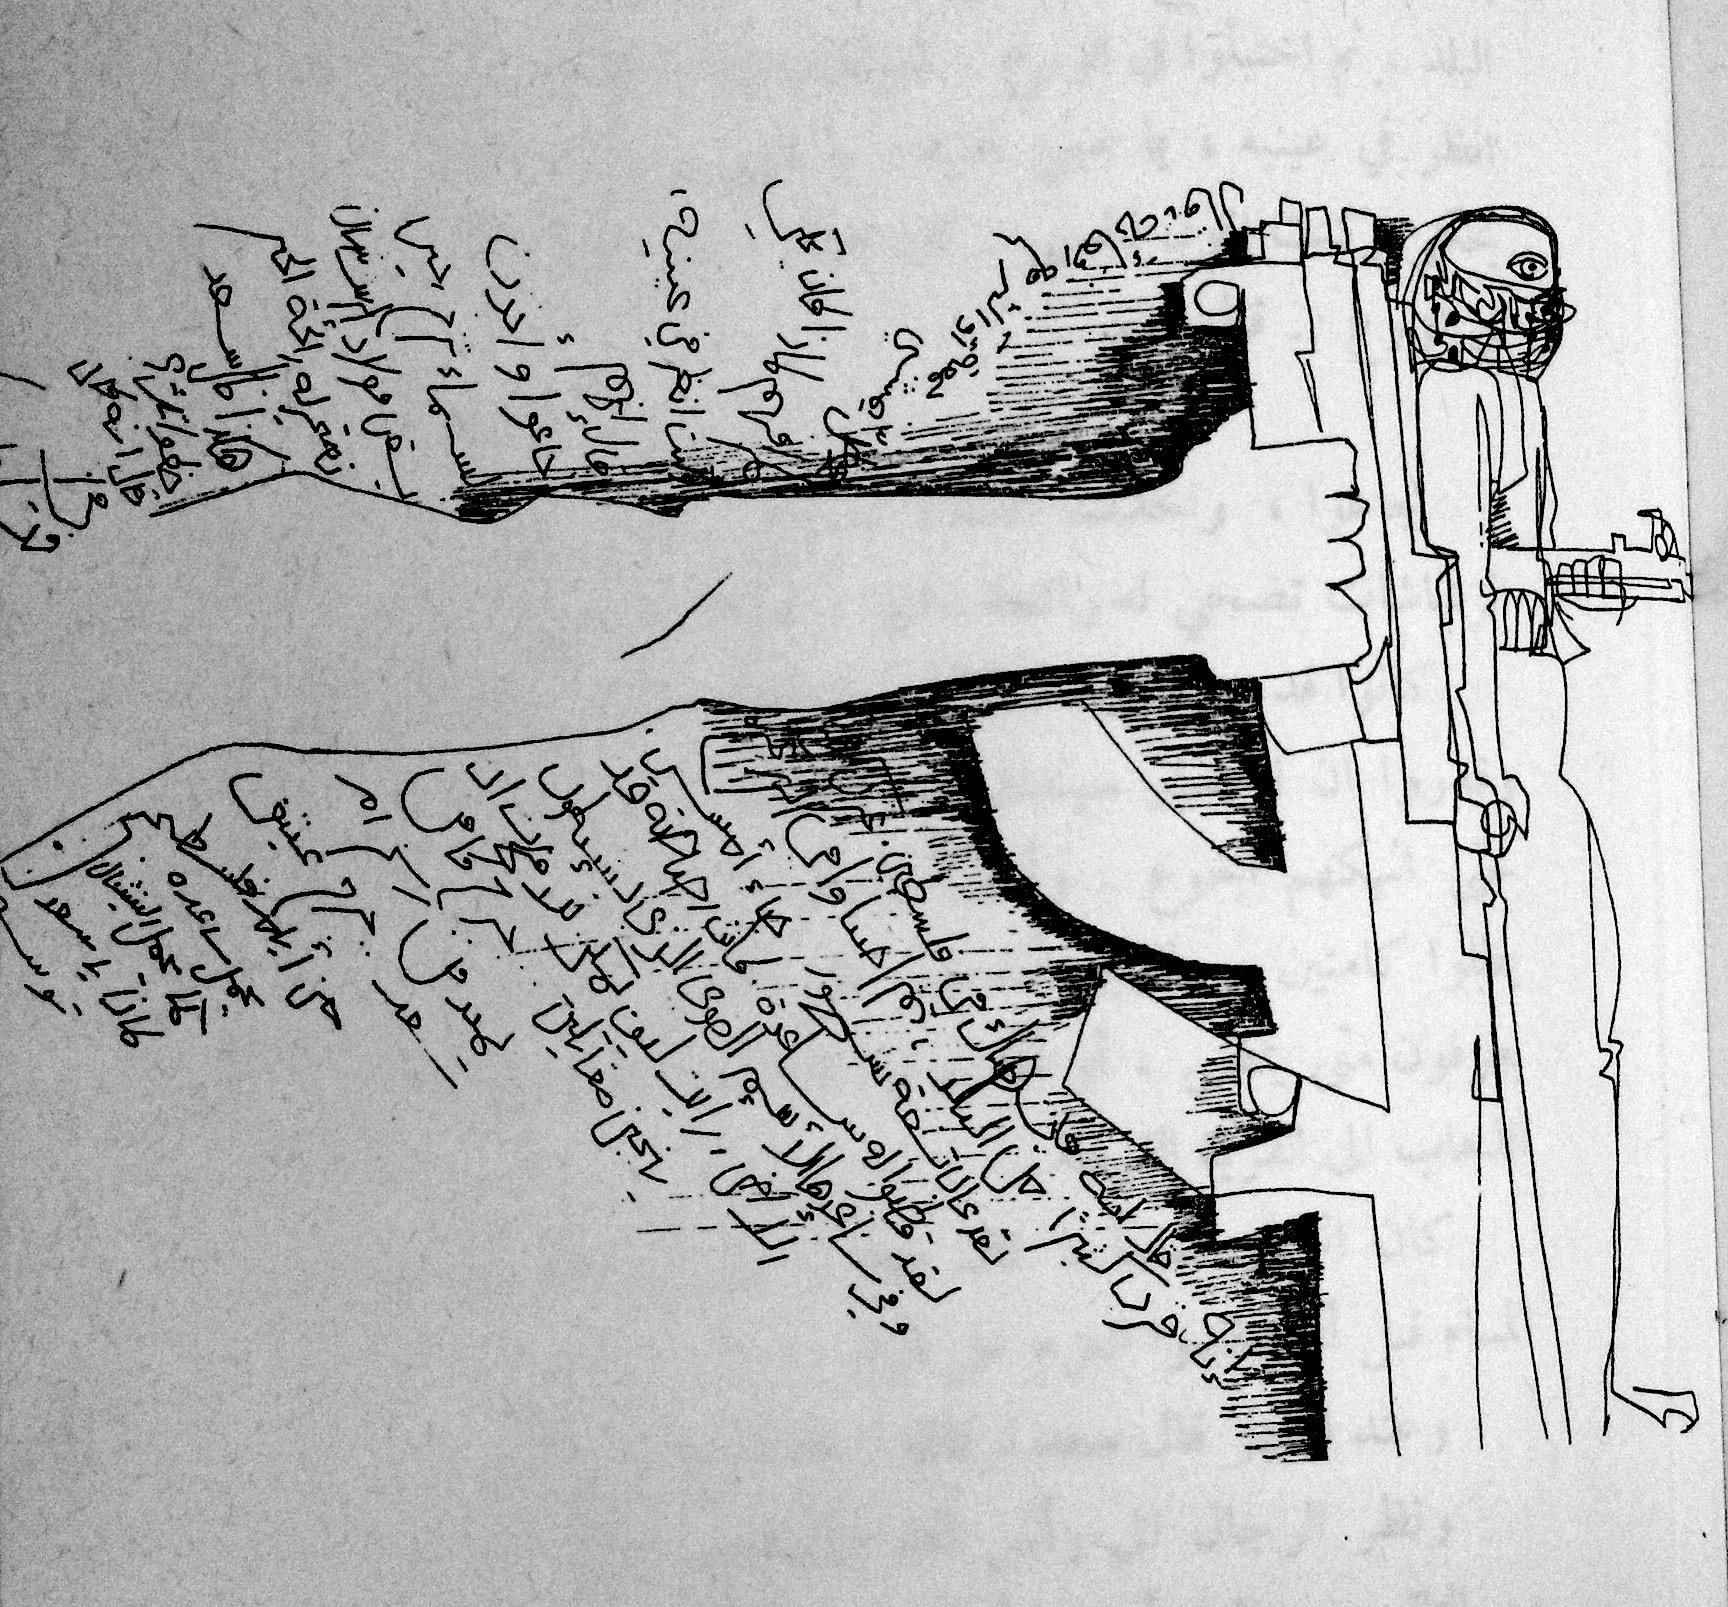 Sixth (and last) in a series by Mona Saudi, in Ghassān Kanafānī's  al-Āthār al-kāmilah , Vol. 1 (Beirut: Dār al-Ṭalīʿah, 1972).